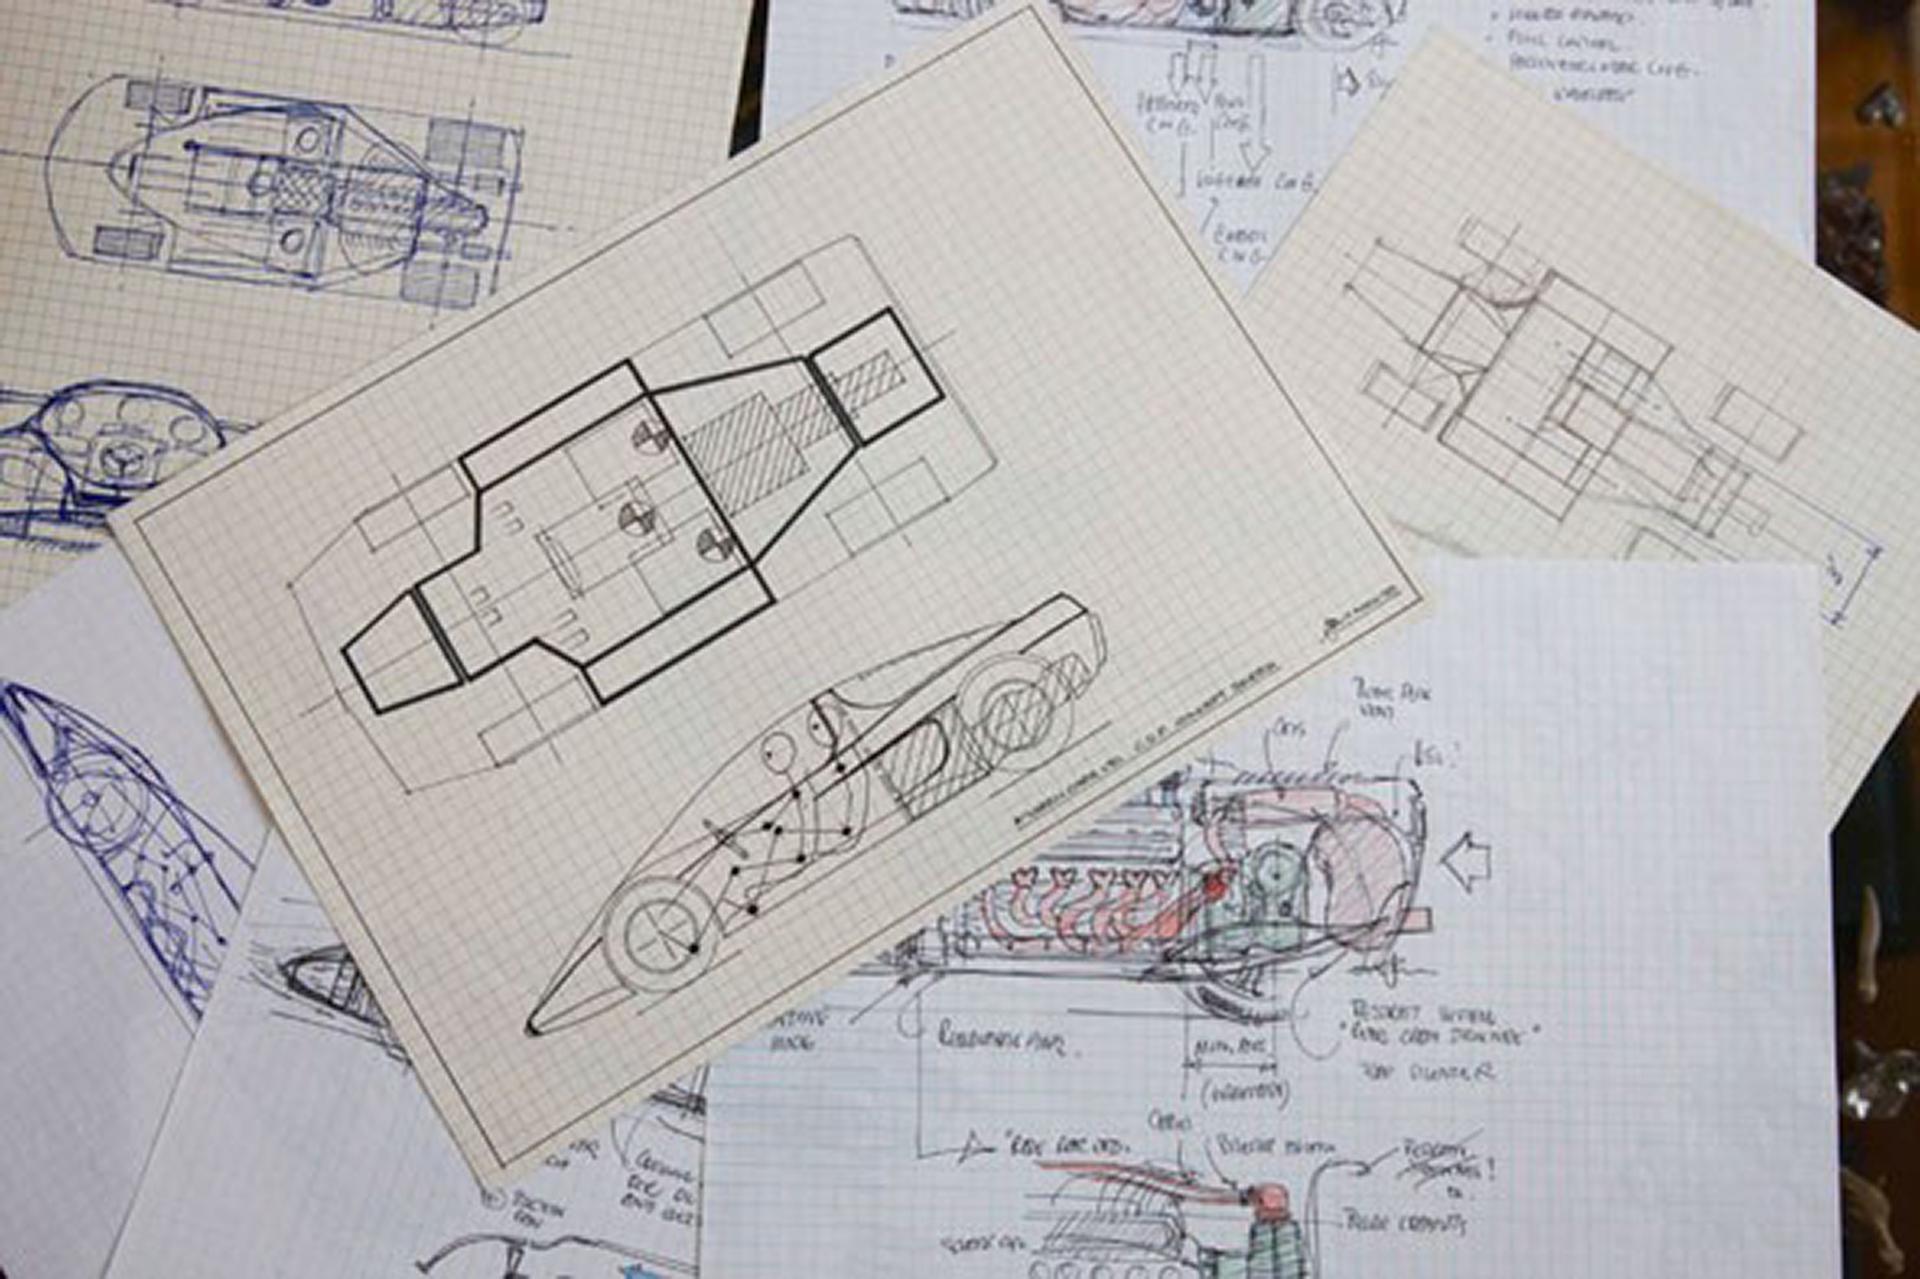 McLaren F1 - blueprint